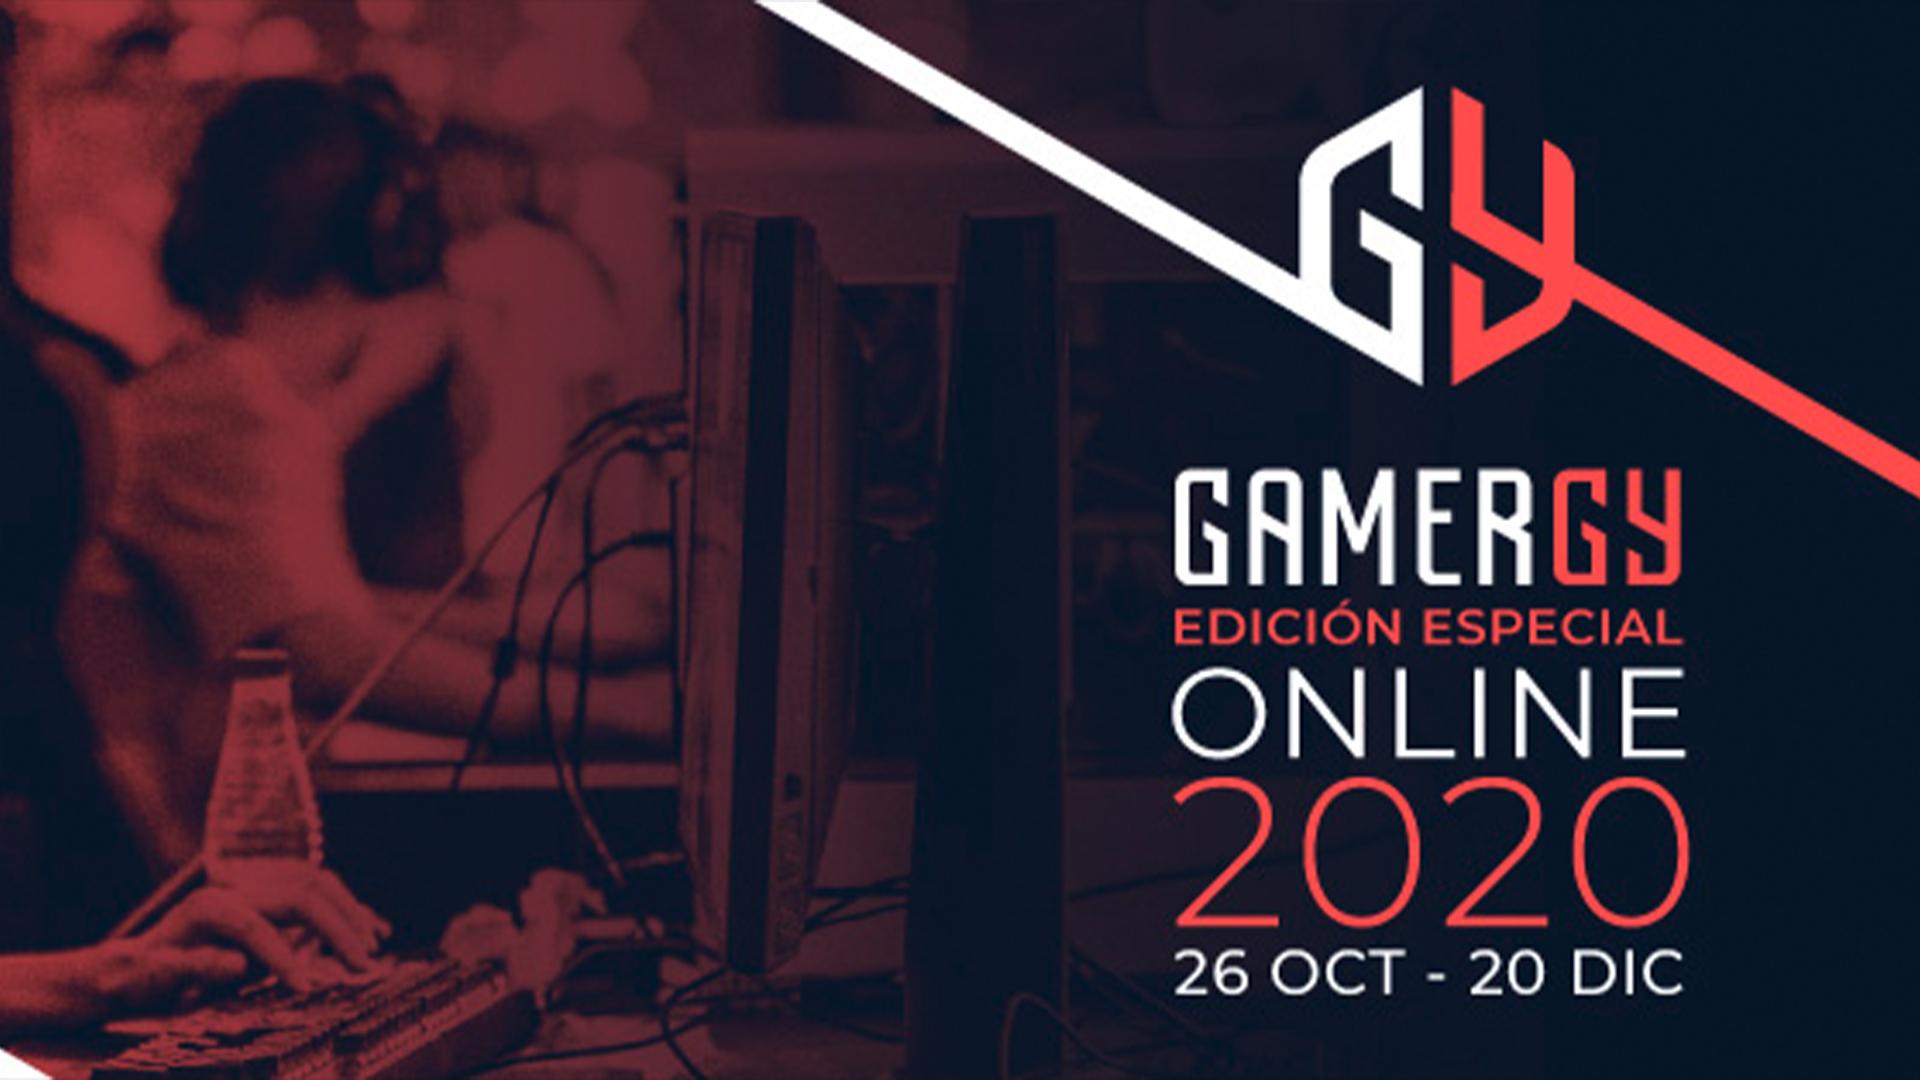 IFEMA arranca GAMERGY Edición Especial Online 2020